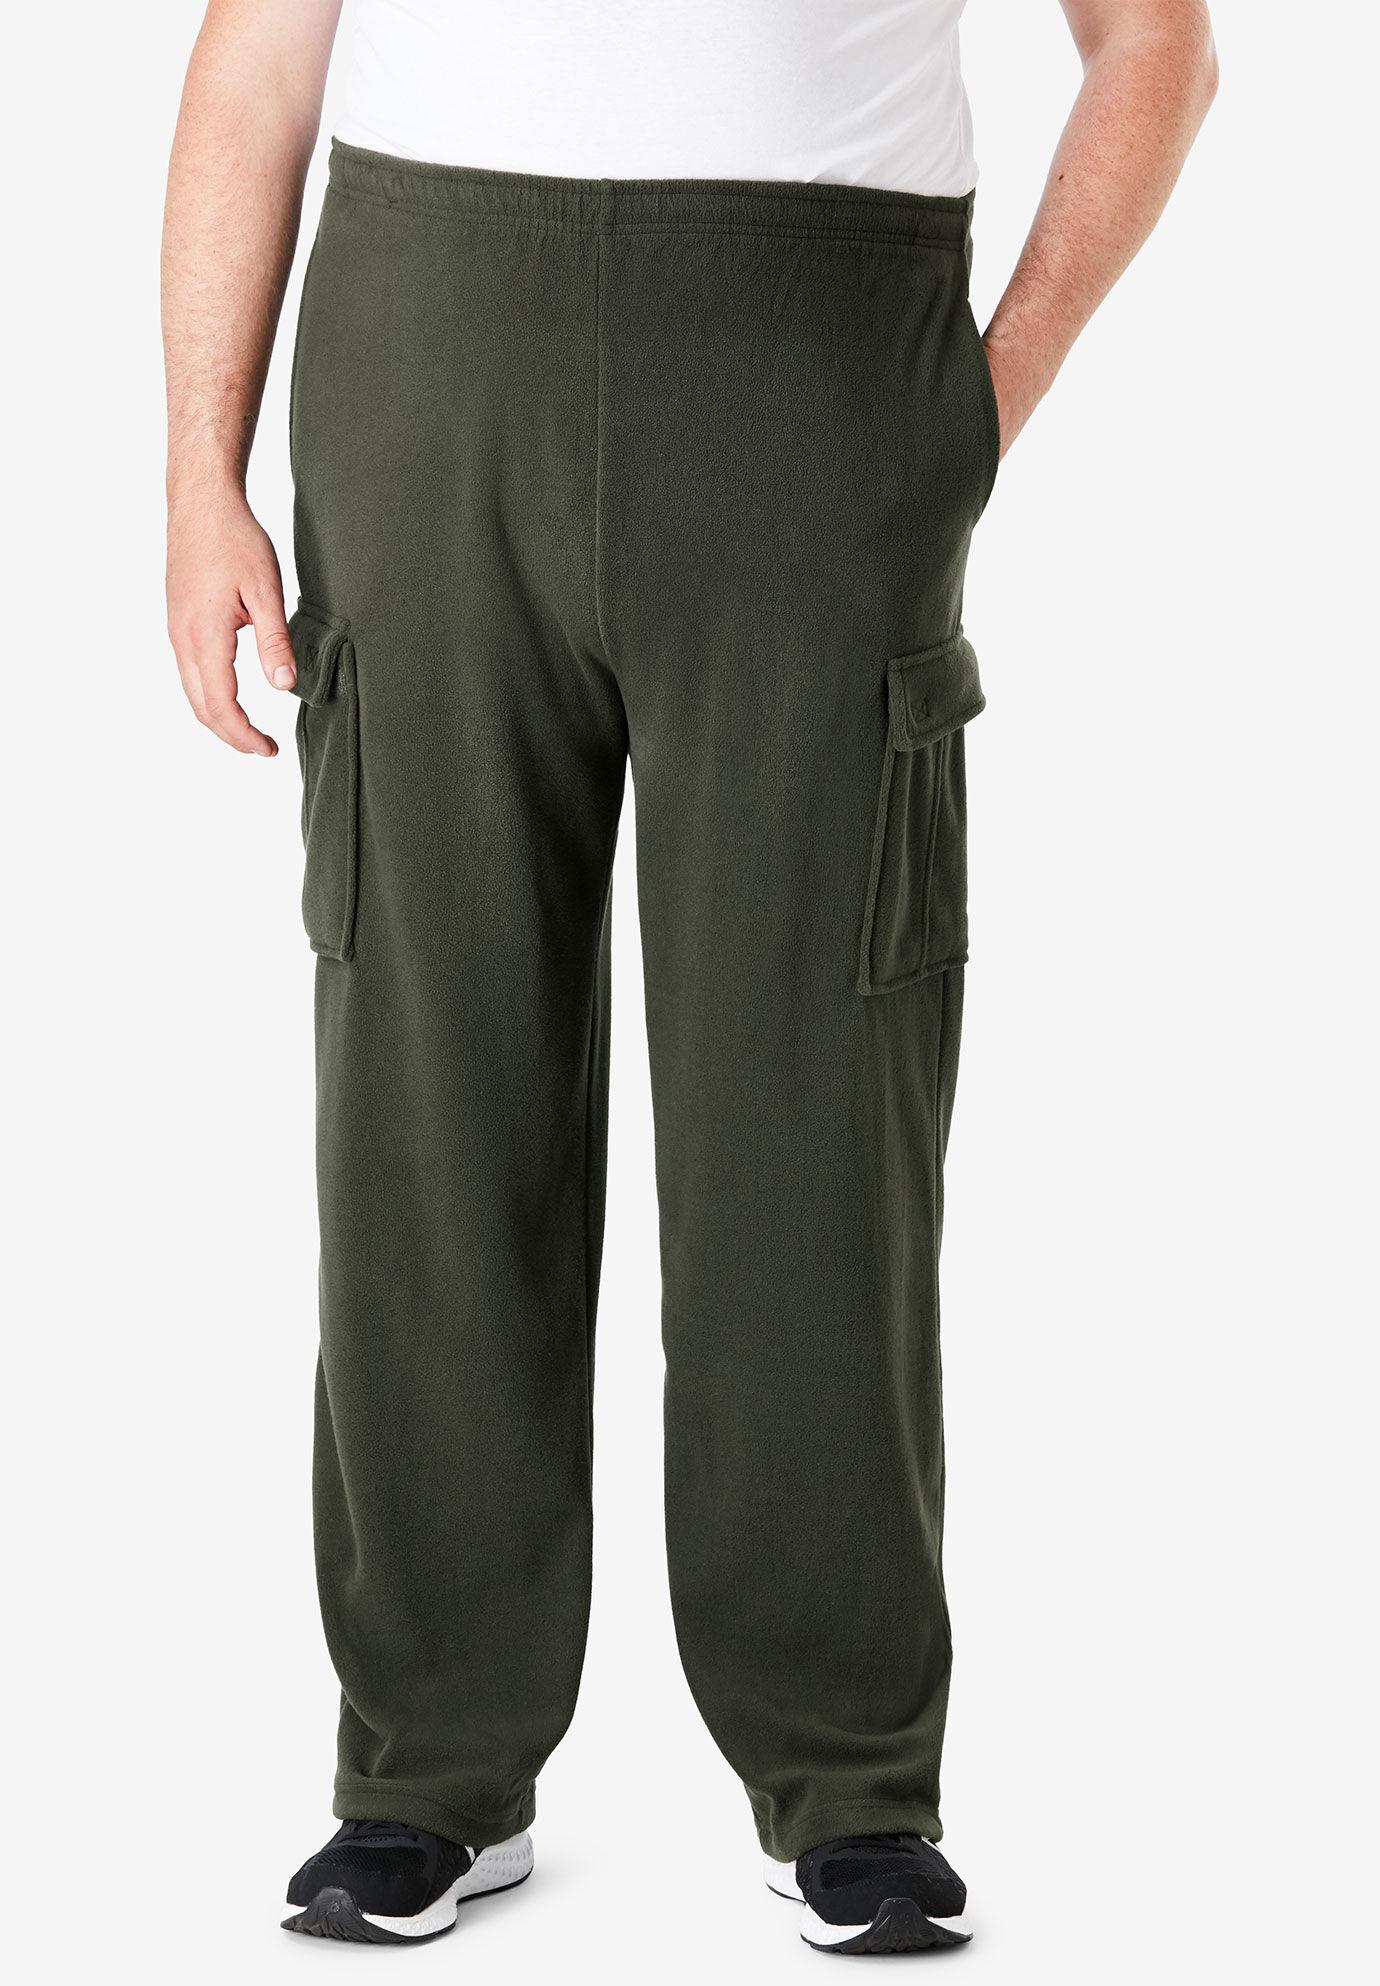 NWT MEN/'S PLUS SIZE FLEECE CARGO SWEATS PANTS OPEN BOTTOM XL-8XL EXPLORER